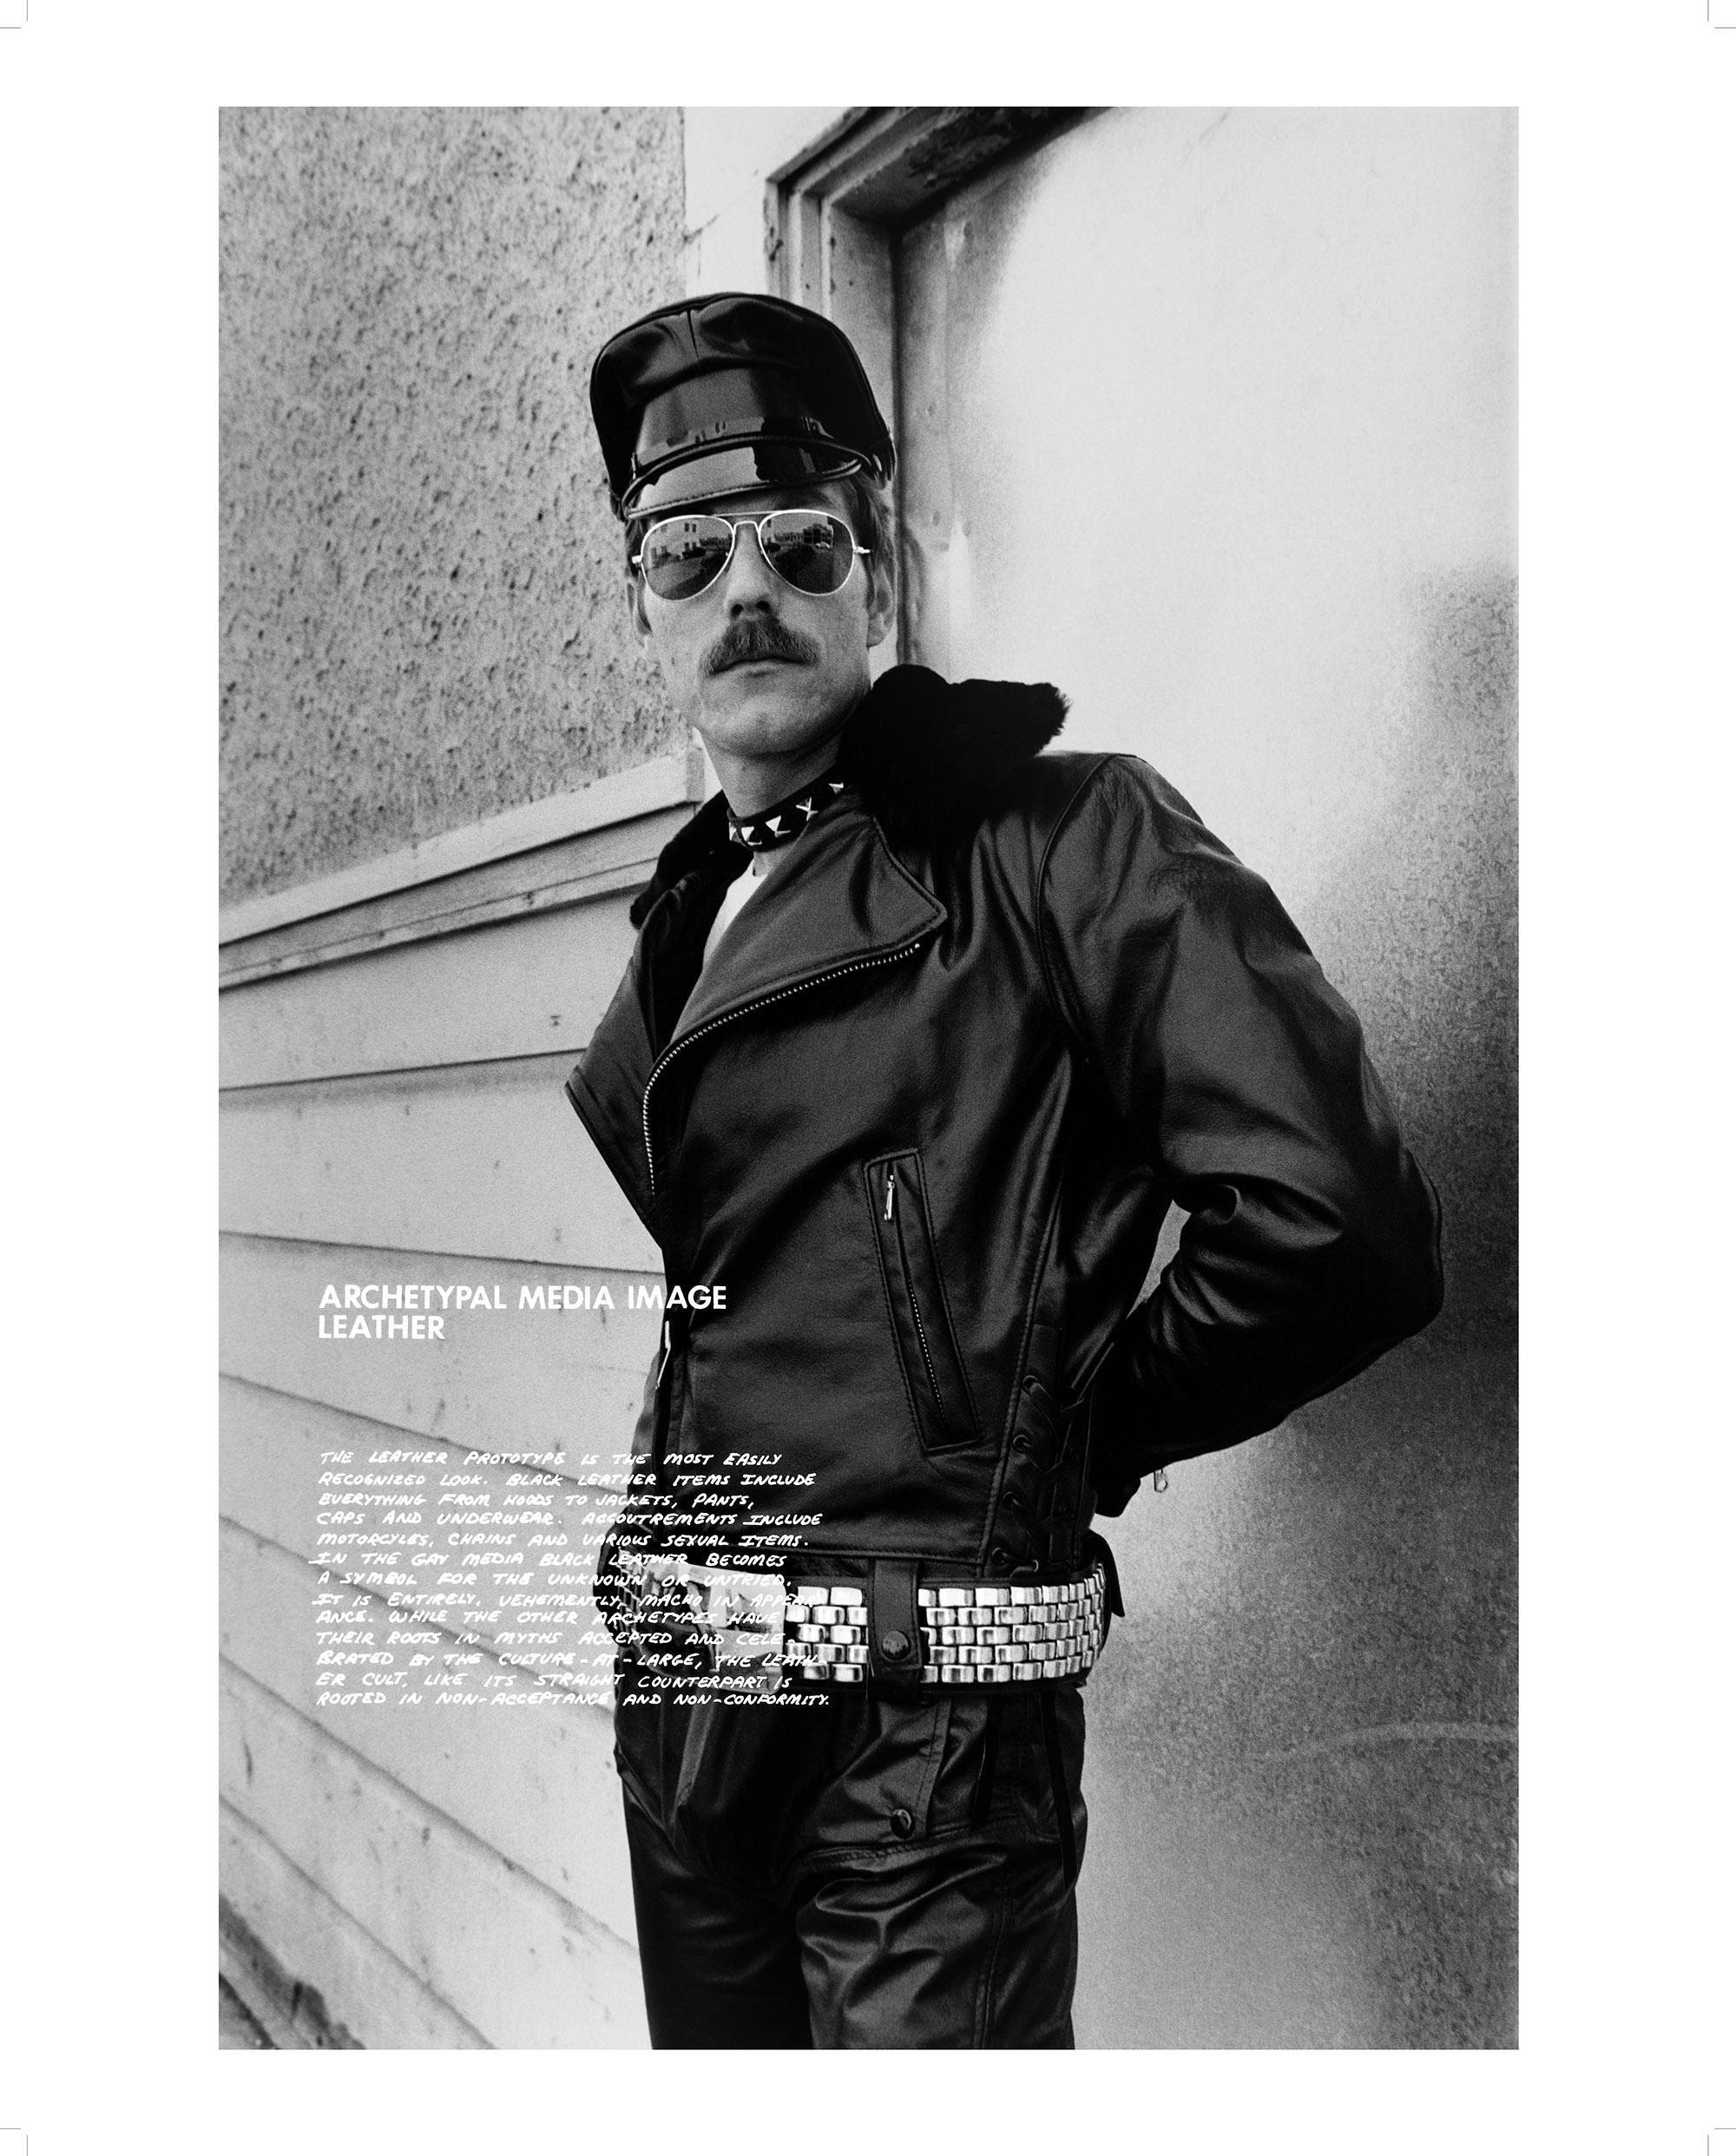 Archetypal Media Image: Leather